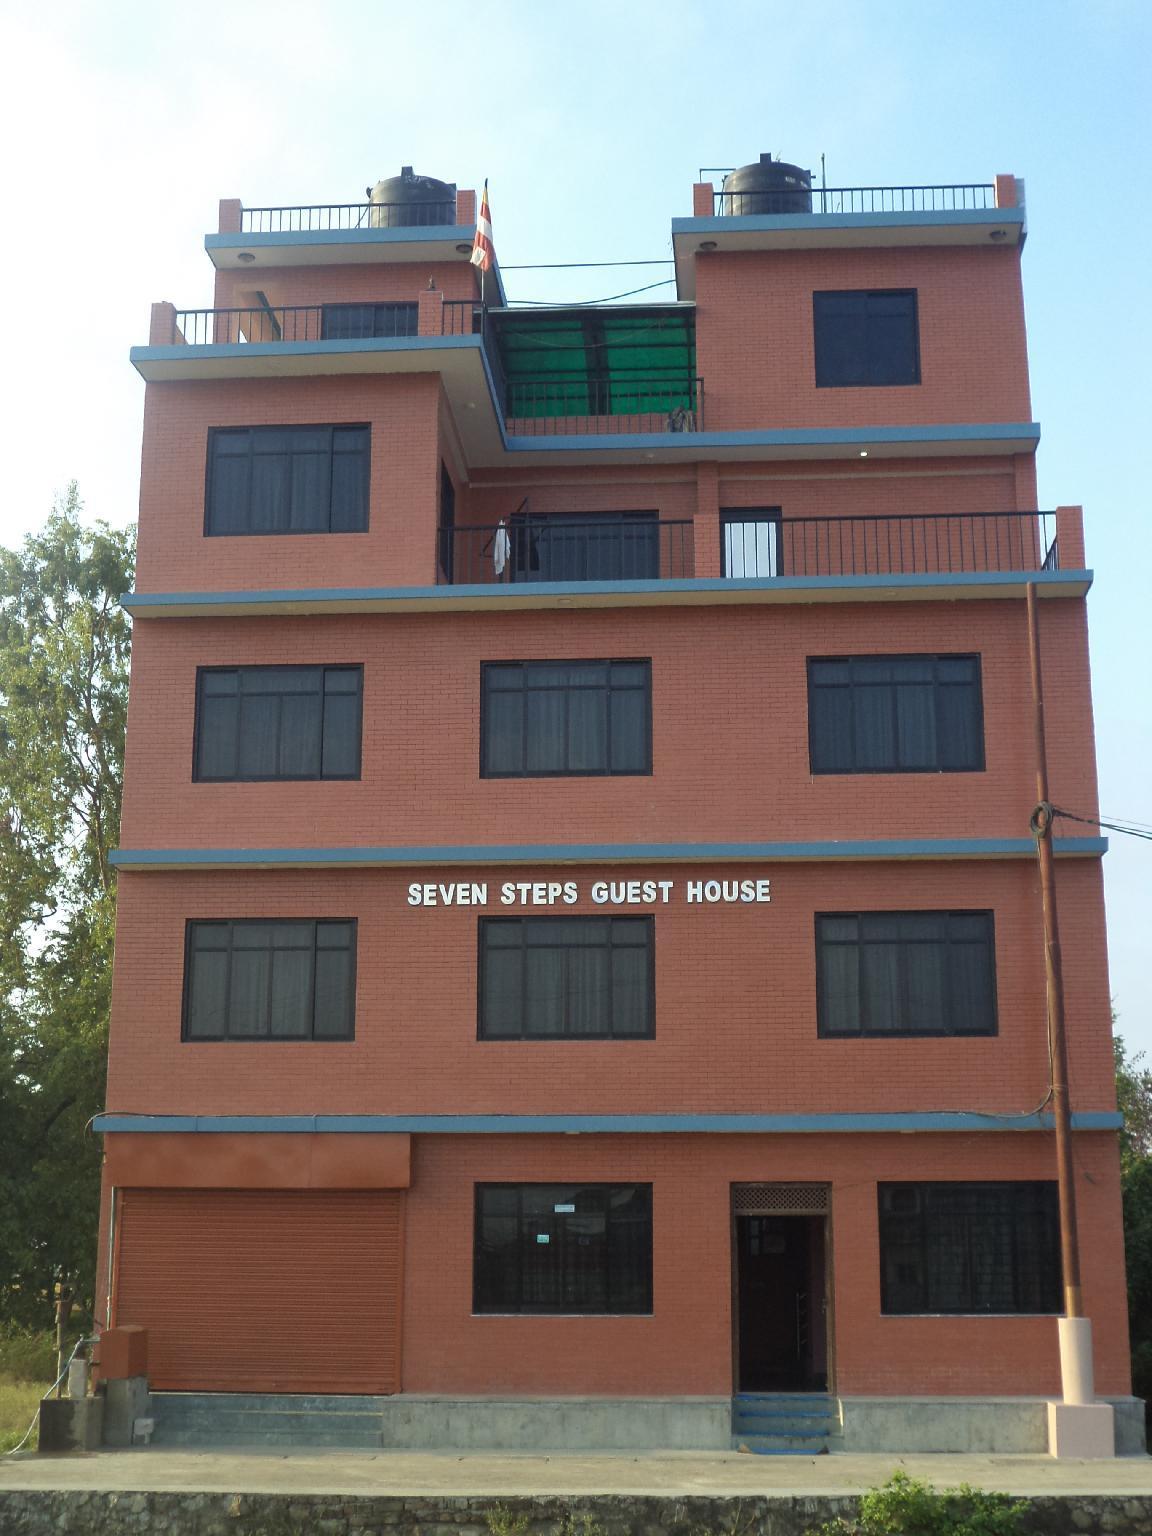 Seven Steps Guest House